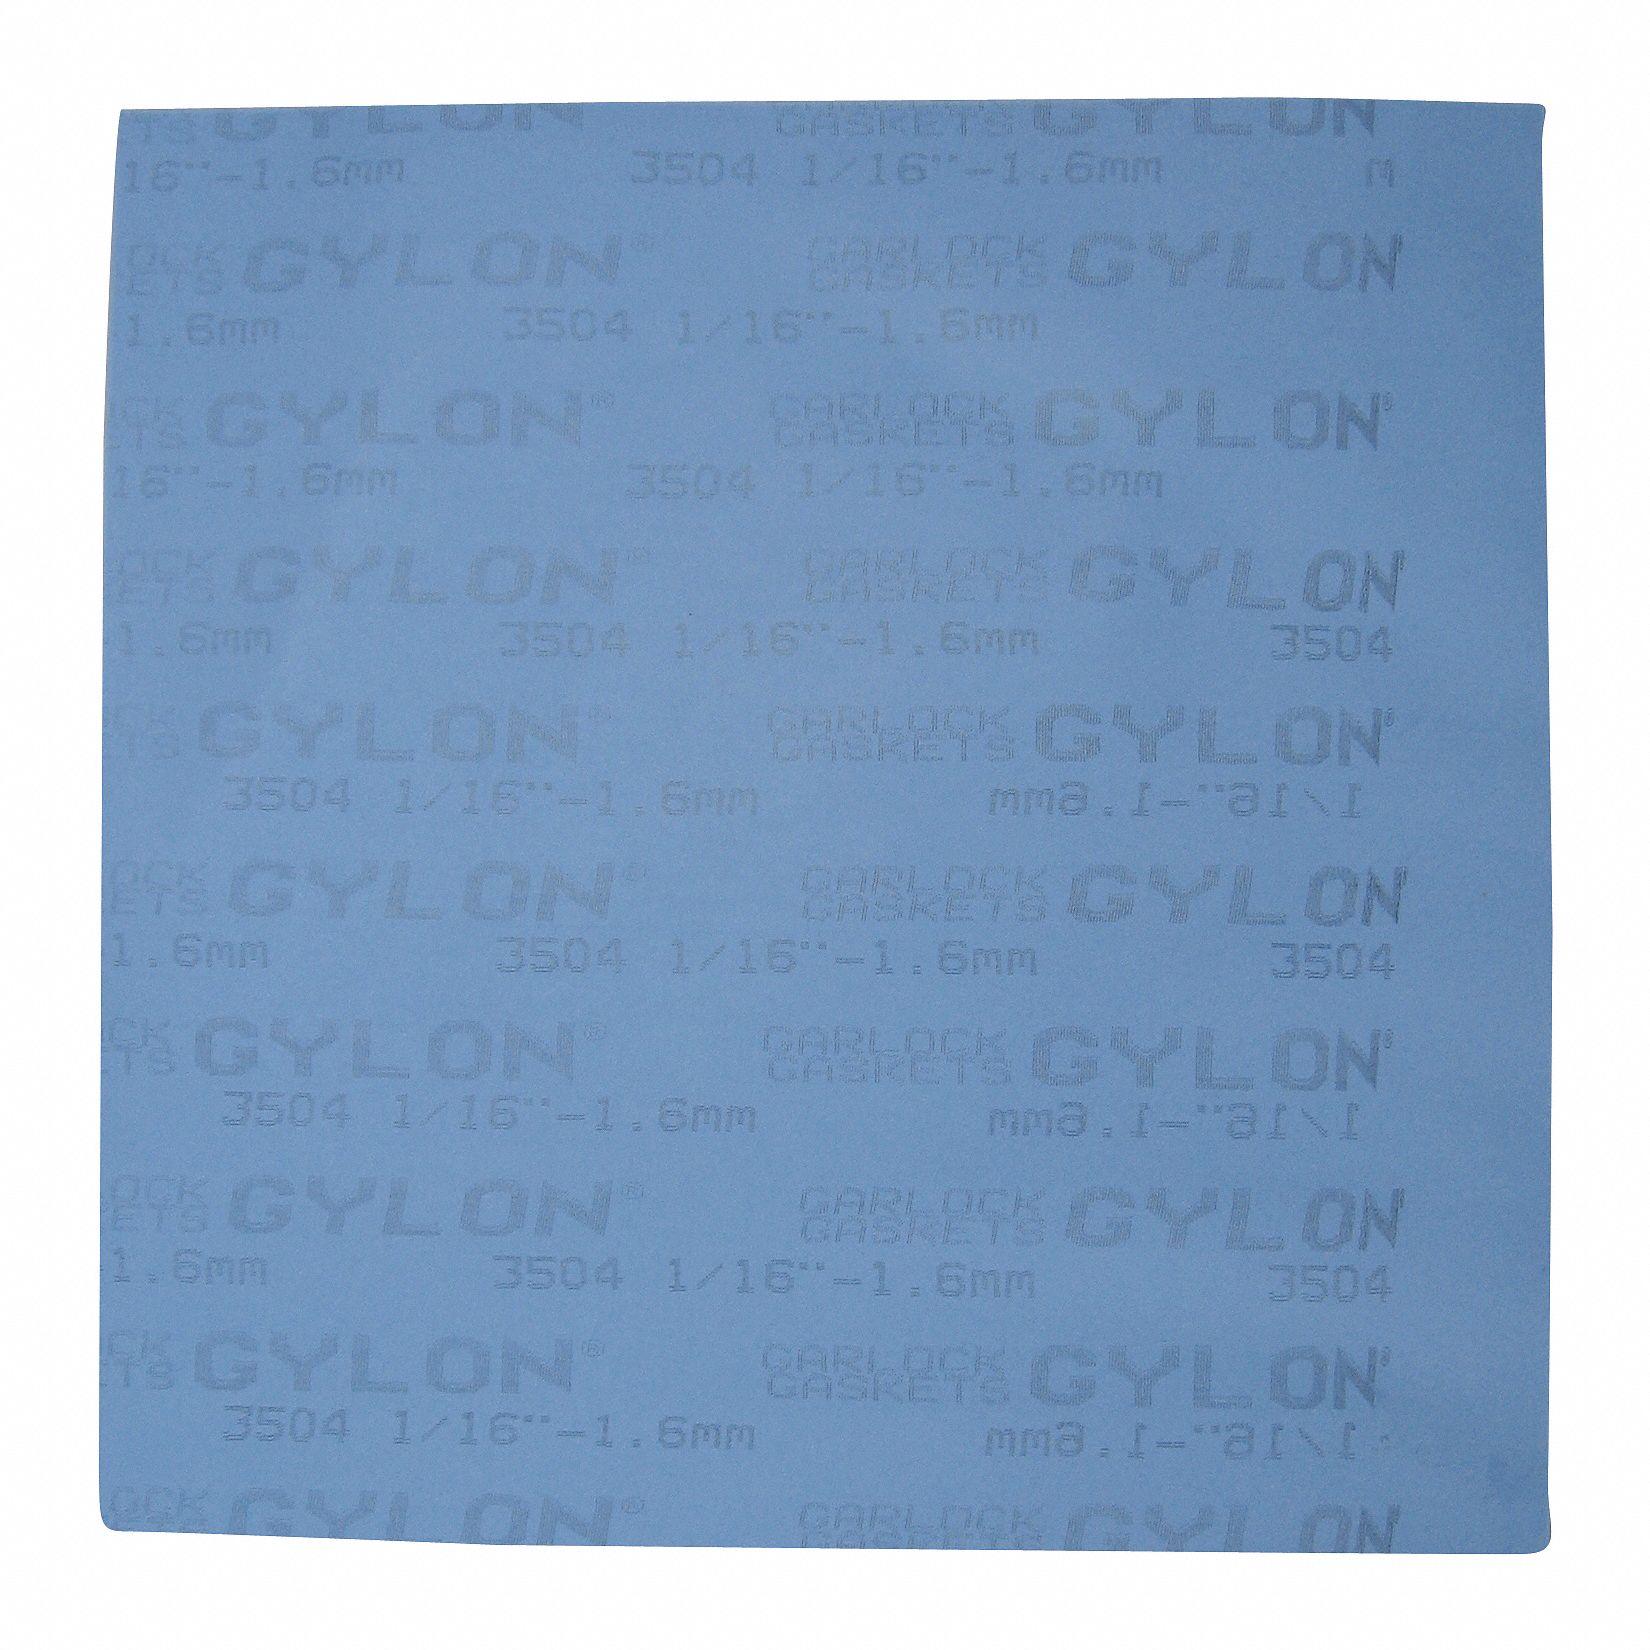 GARLOCK Sealing Technologies PTFE with Glass Microspheres Gasket Sheet Blue